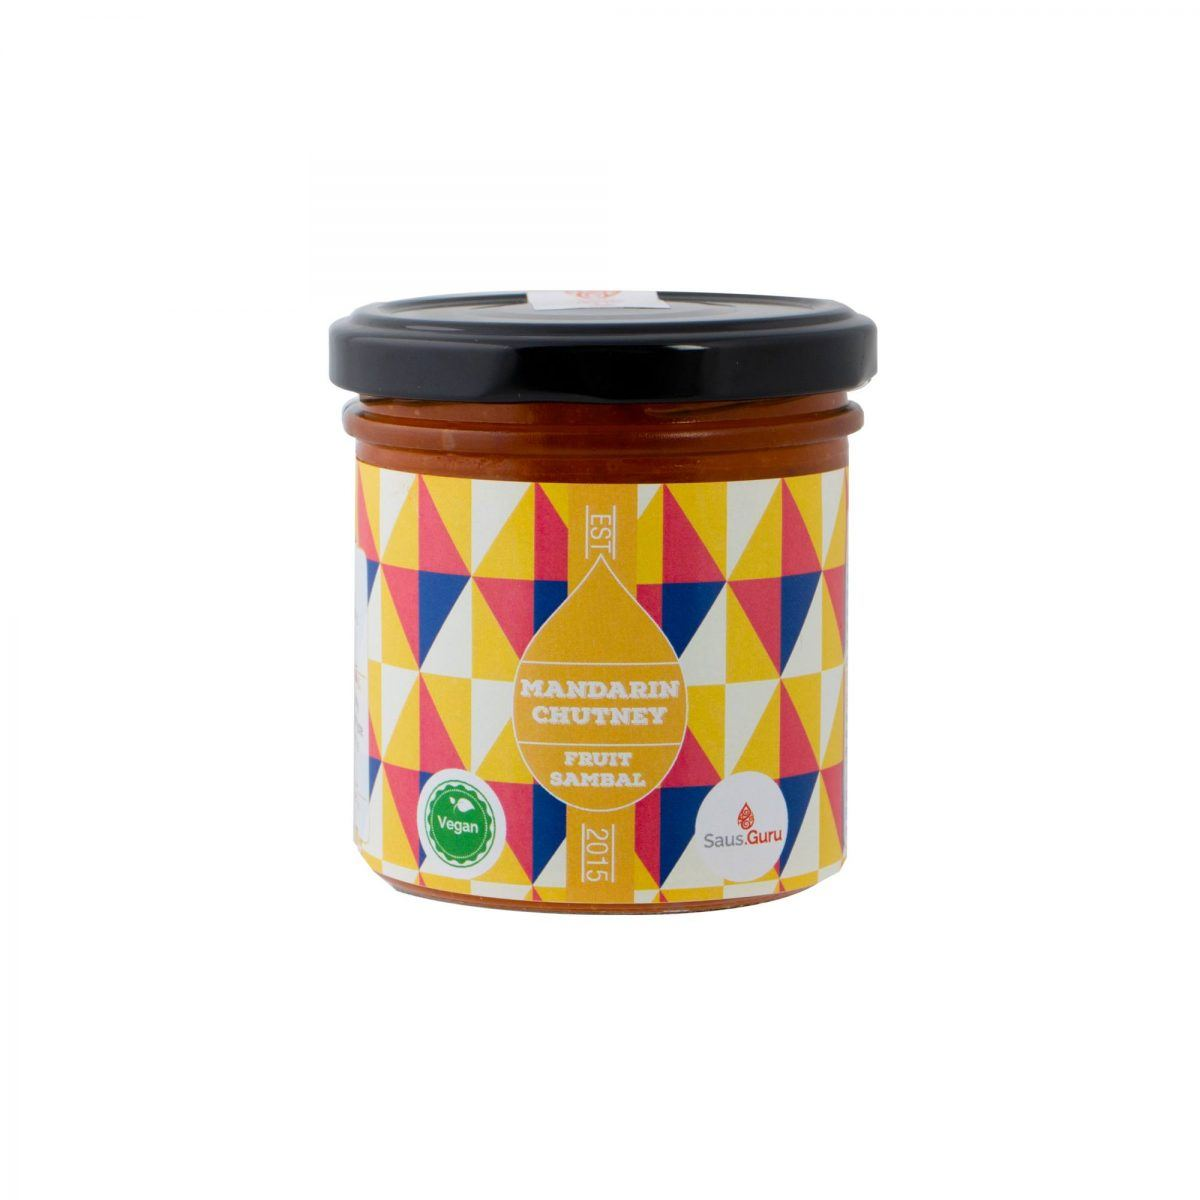 Saus.Guru fruit sambal mandarin chutney